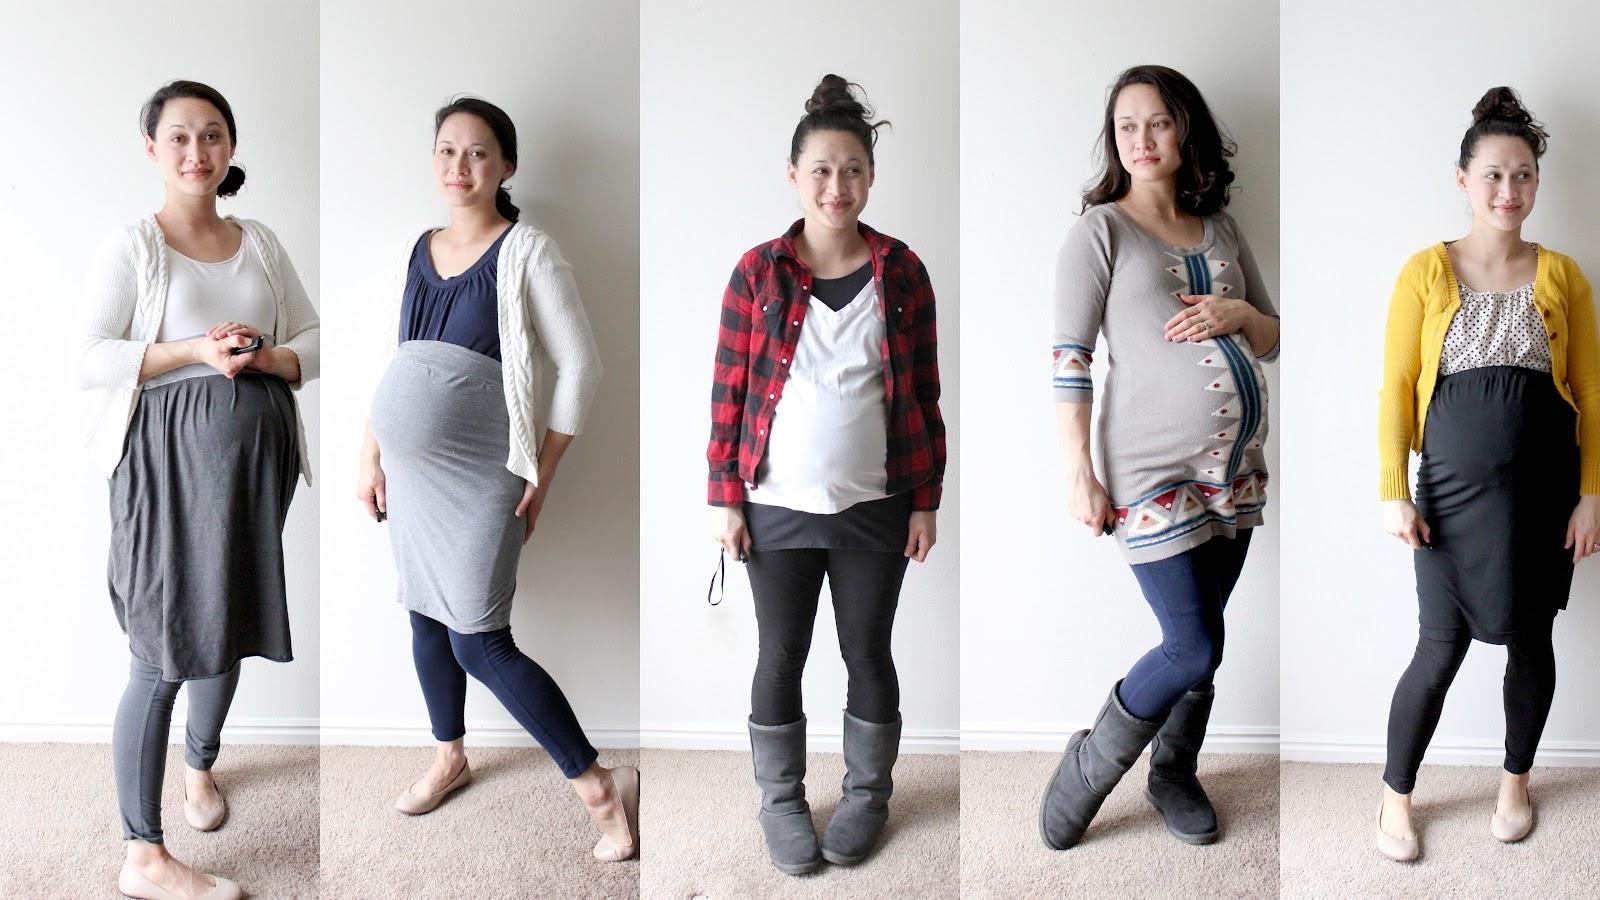 d336fd84779a Nesting  DIY Maternity Photo Shoot